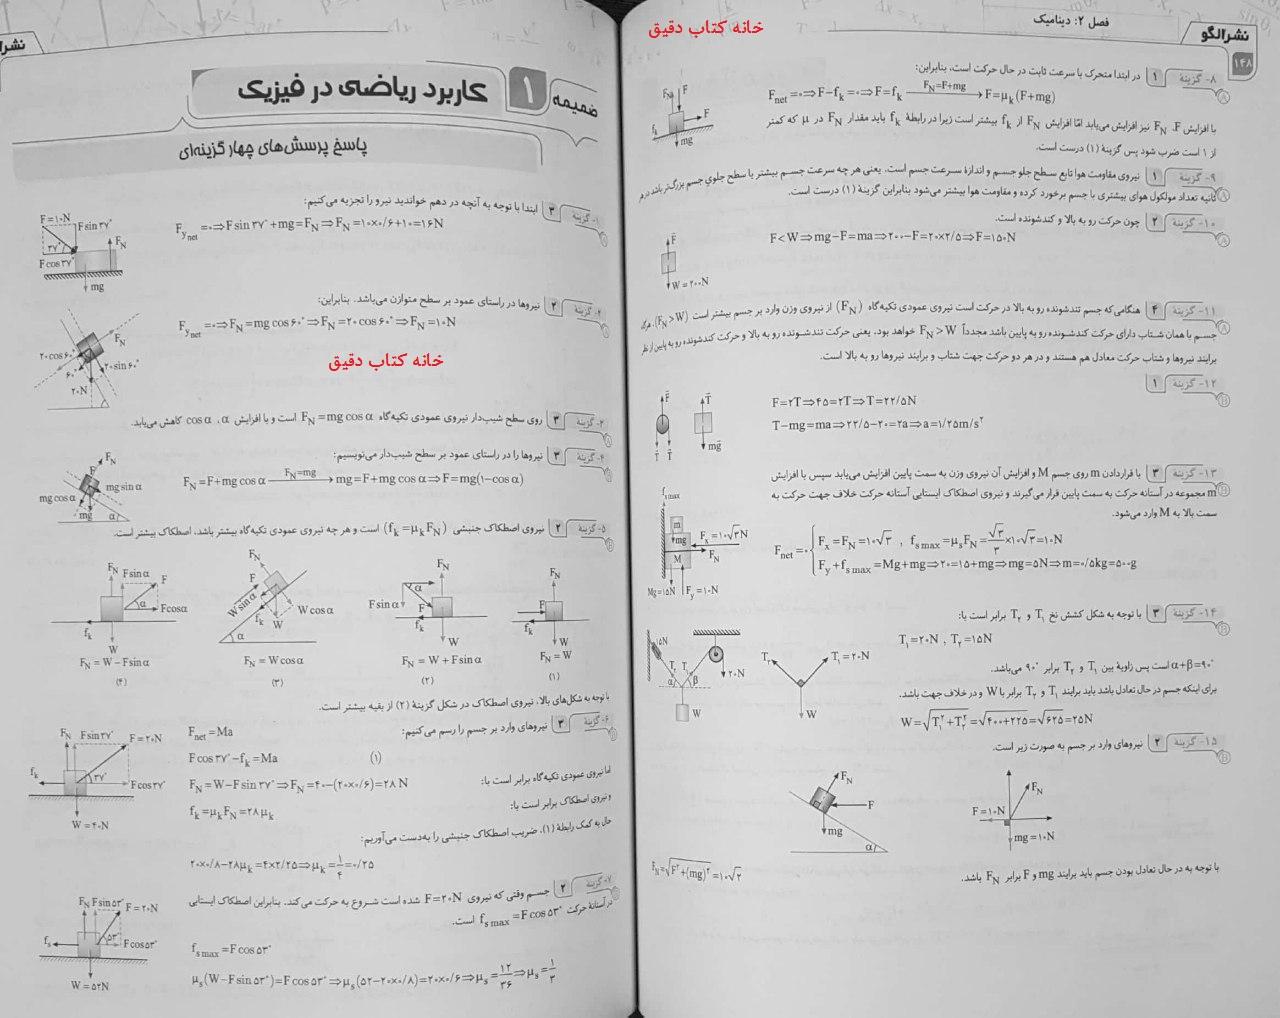 فیزیک جامع 12 نشر الگو پاسخ تشریحی